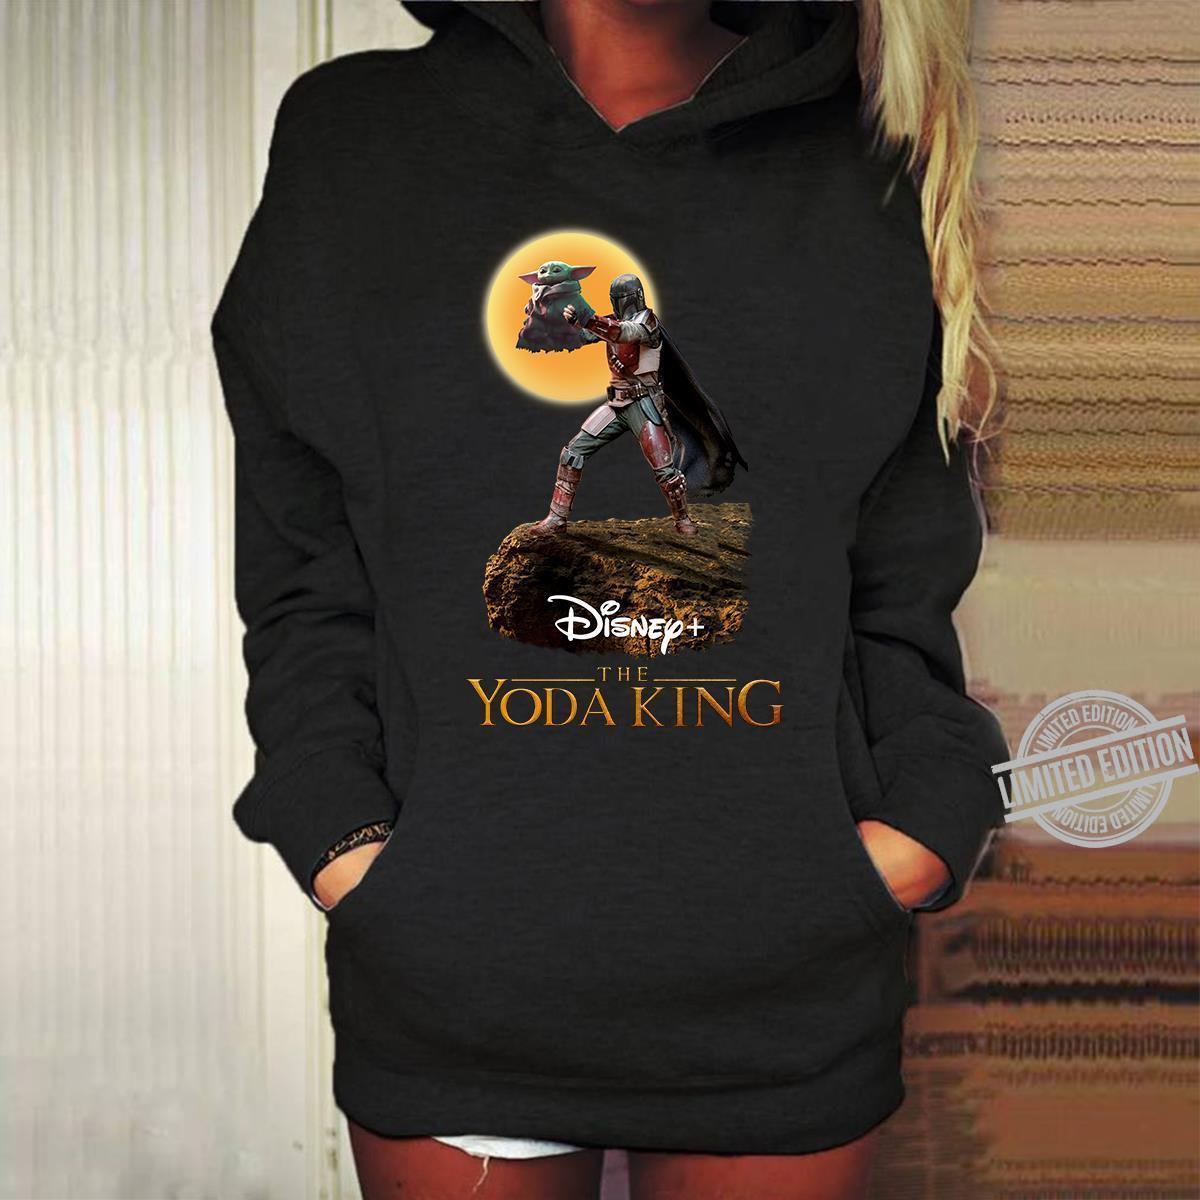 Disney The Yoda King Shirt